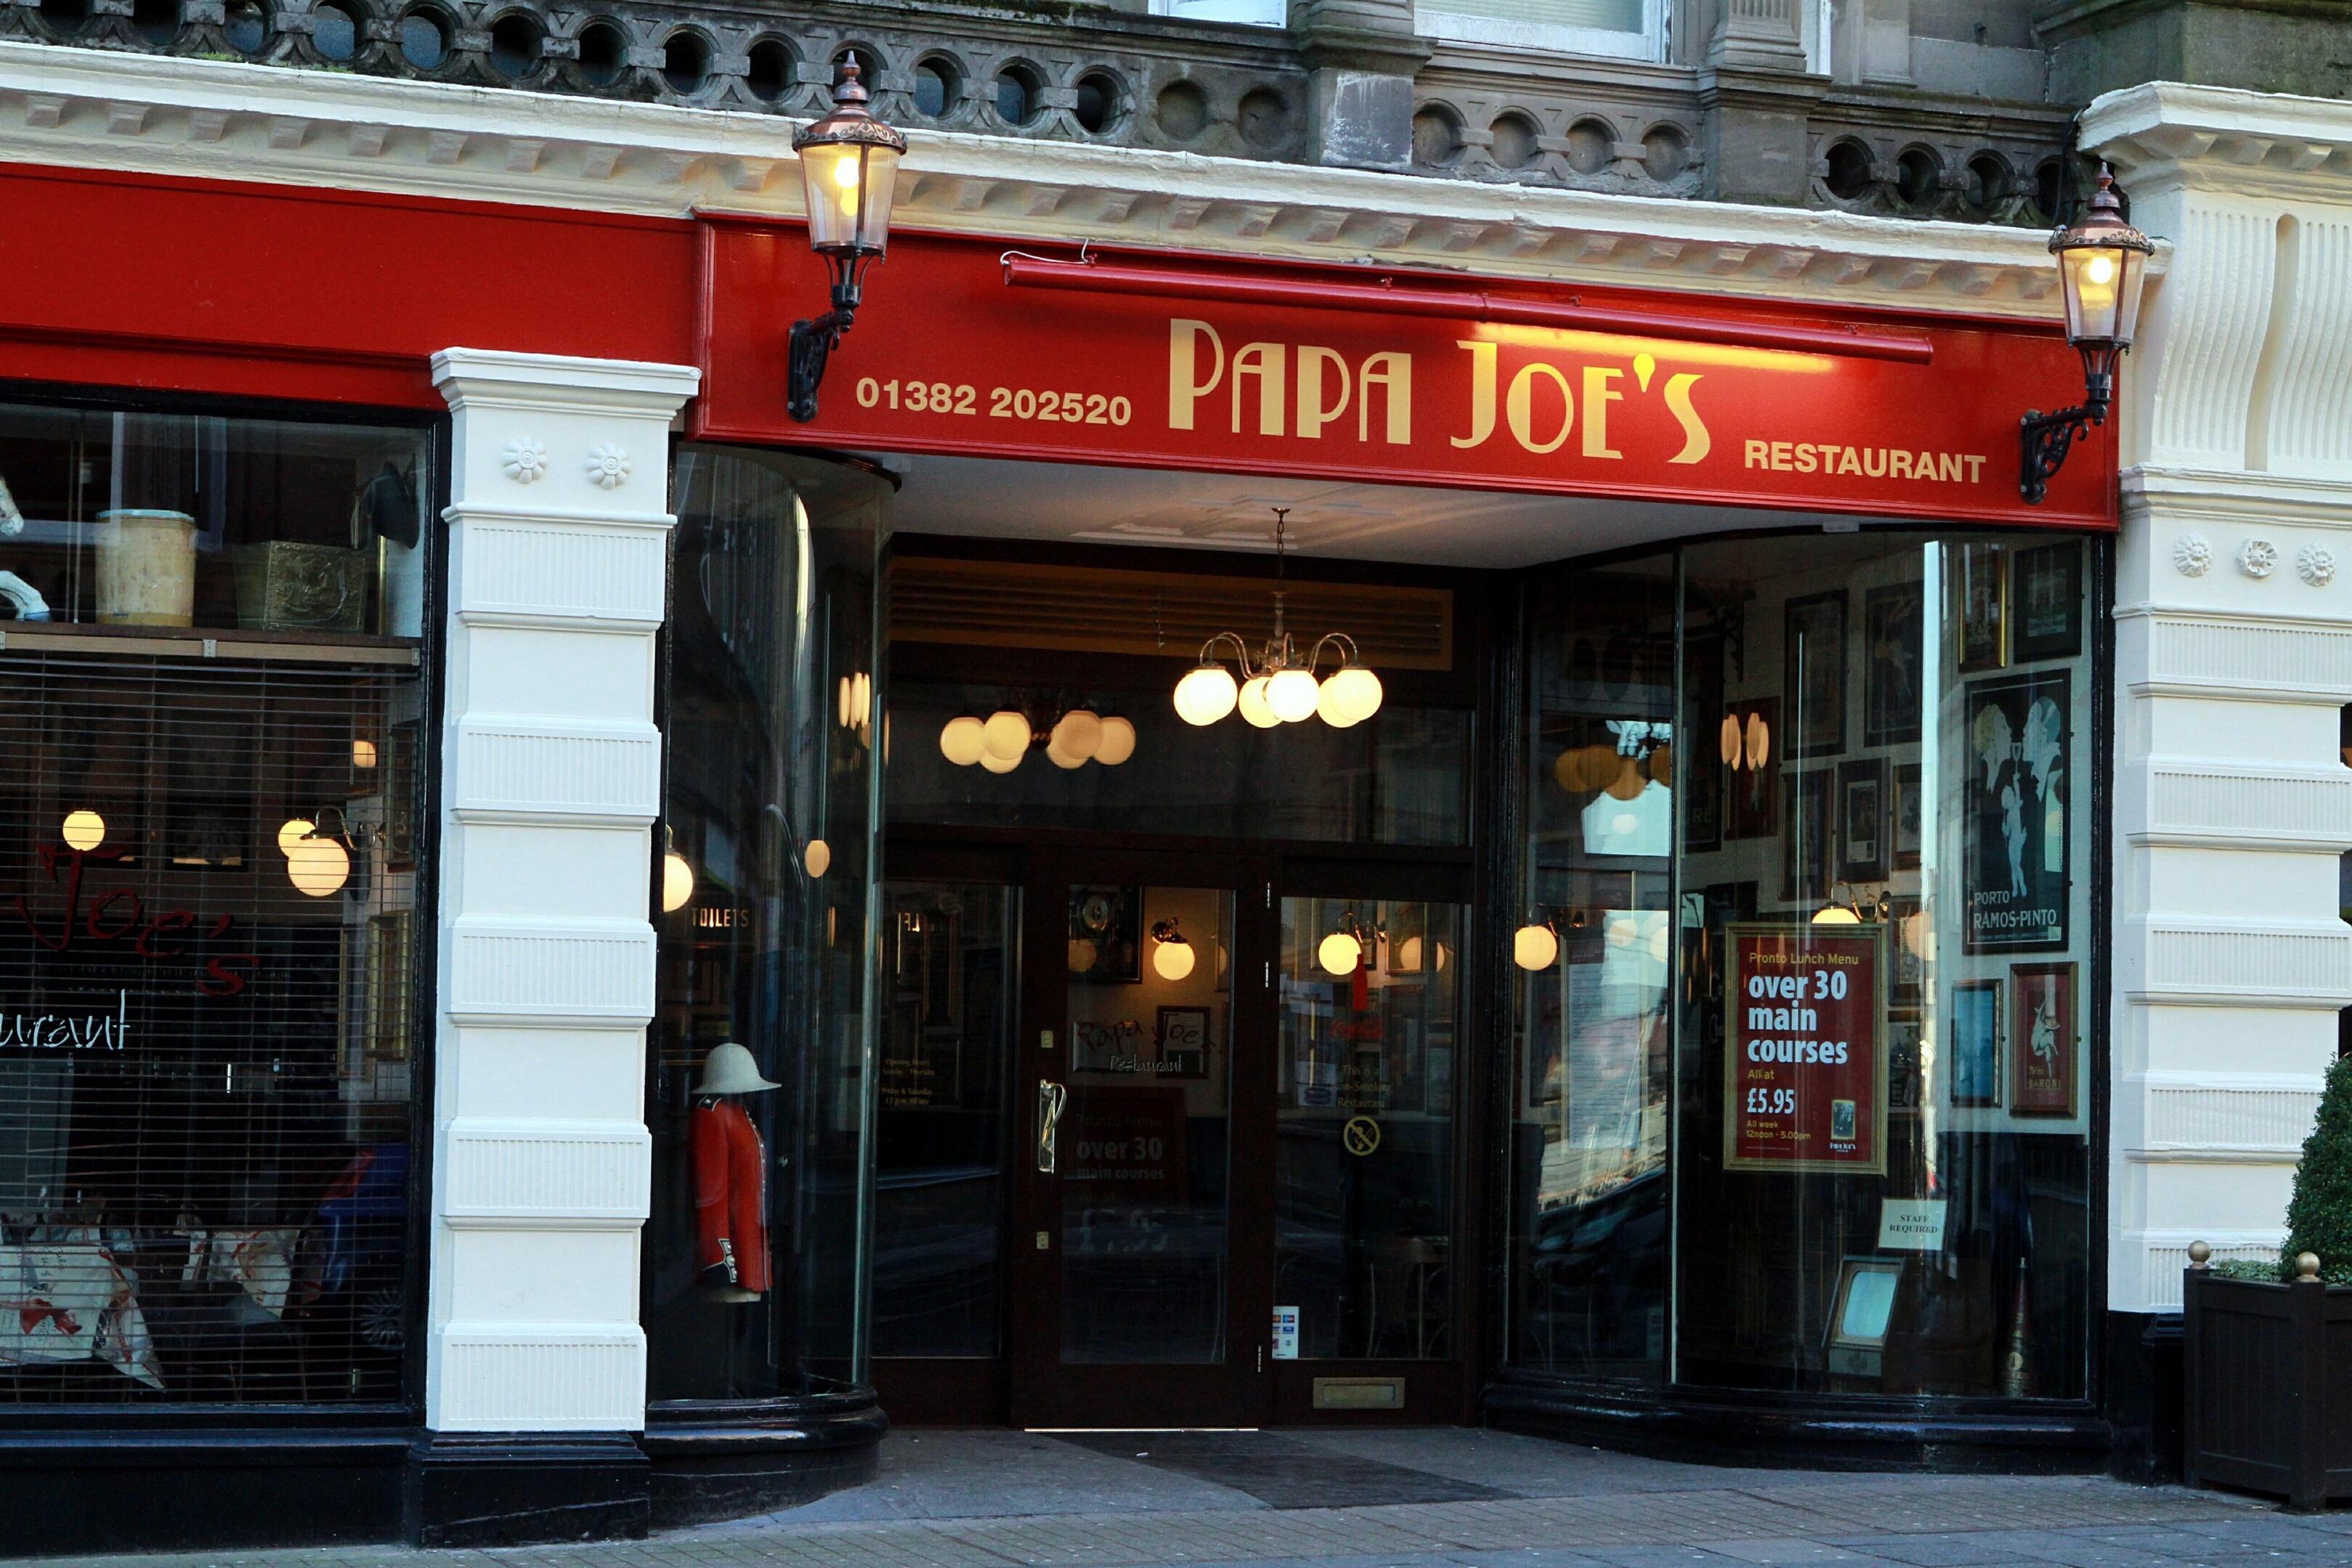 Papa Joe's will be re-launched as Tony Macaroni.